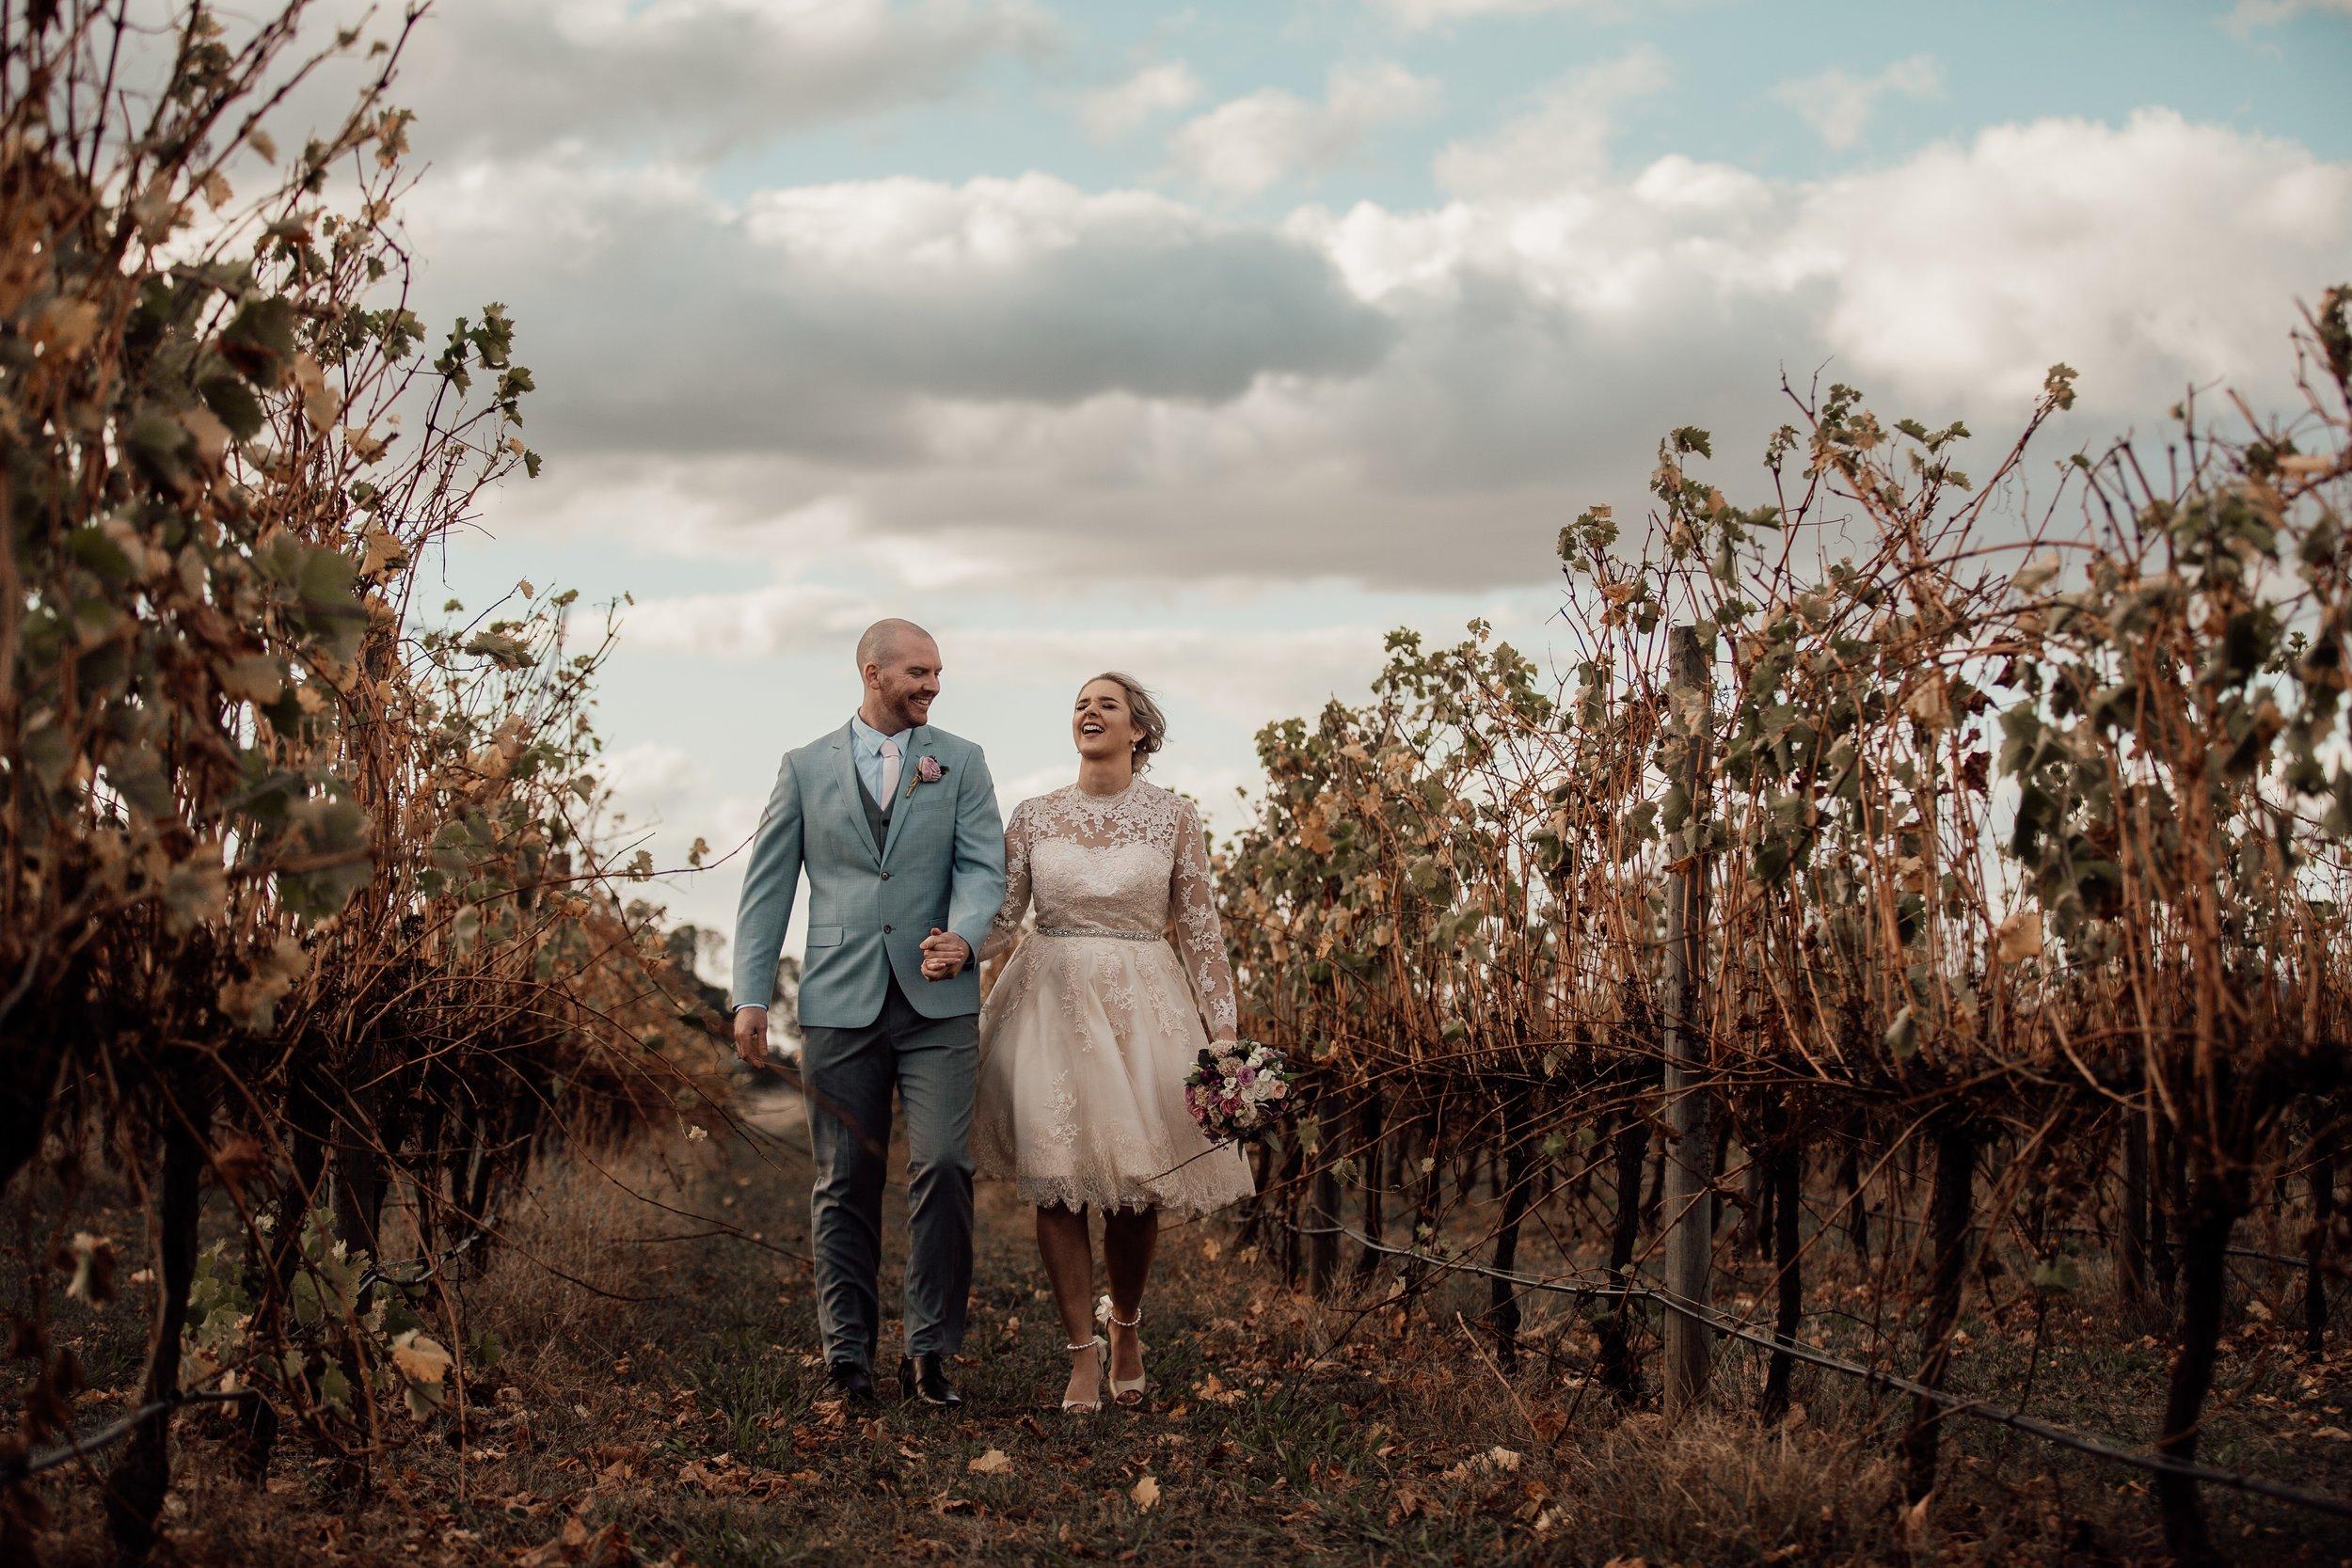 mickalathomas_puremacphotography_weddingphotographer_couplephotographer_Sheppartonphotographer_1484.jpg